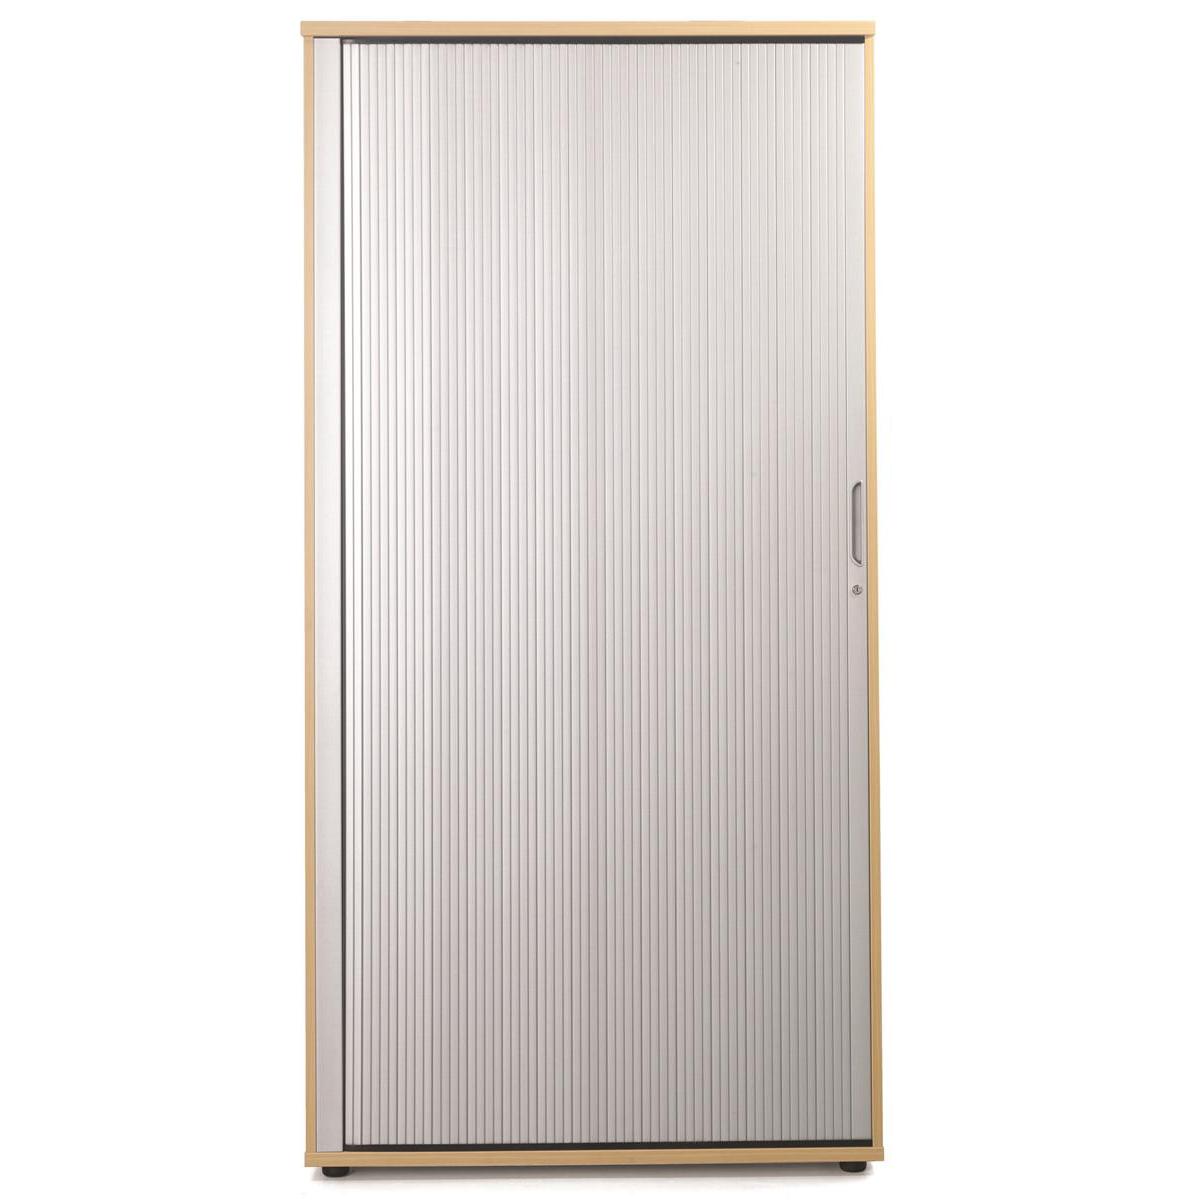 Sonix Tall Tambour Door Cupboard 1000x525x2000mm 1 Shelf Rich Beech/Silver Ref w9871b